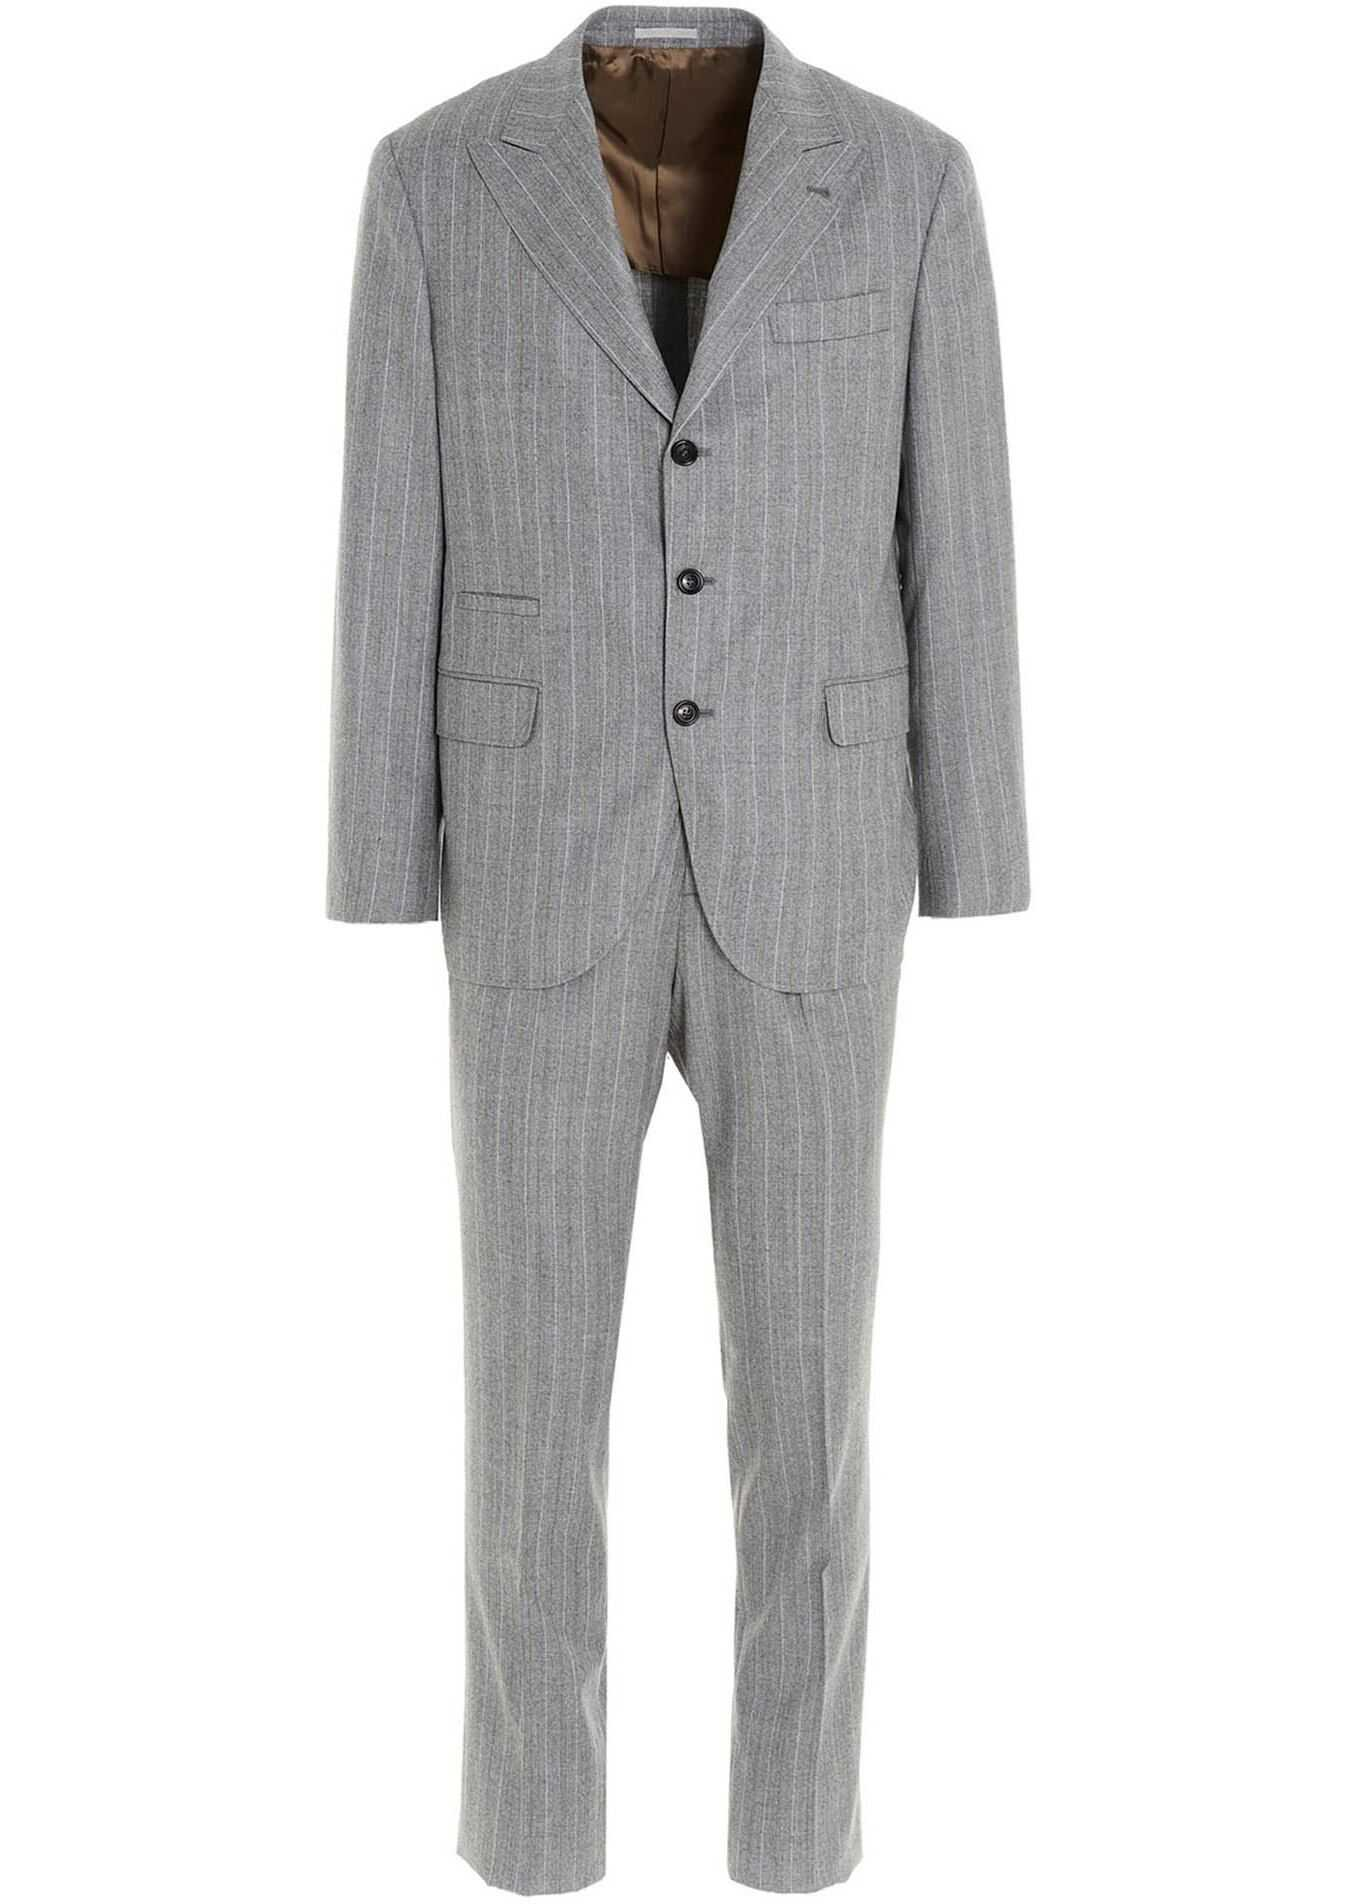 Brunello Cucinelli Pinstripe Suit In Light Grey Grey imagine